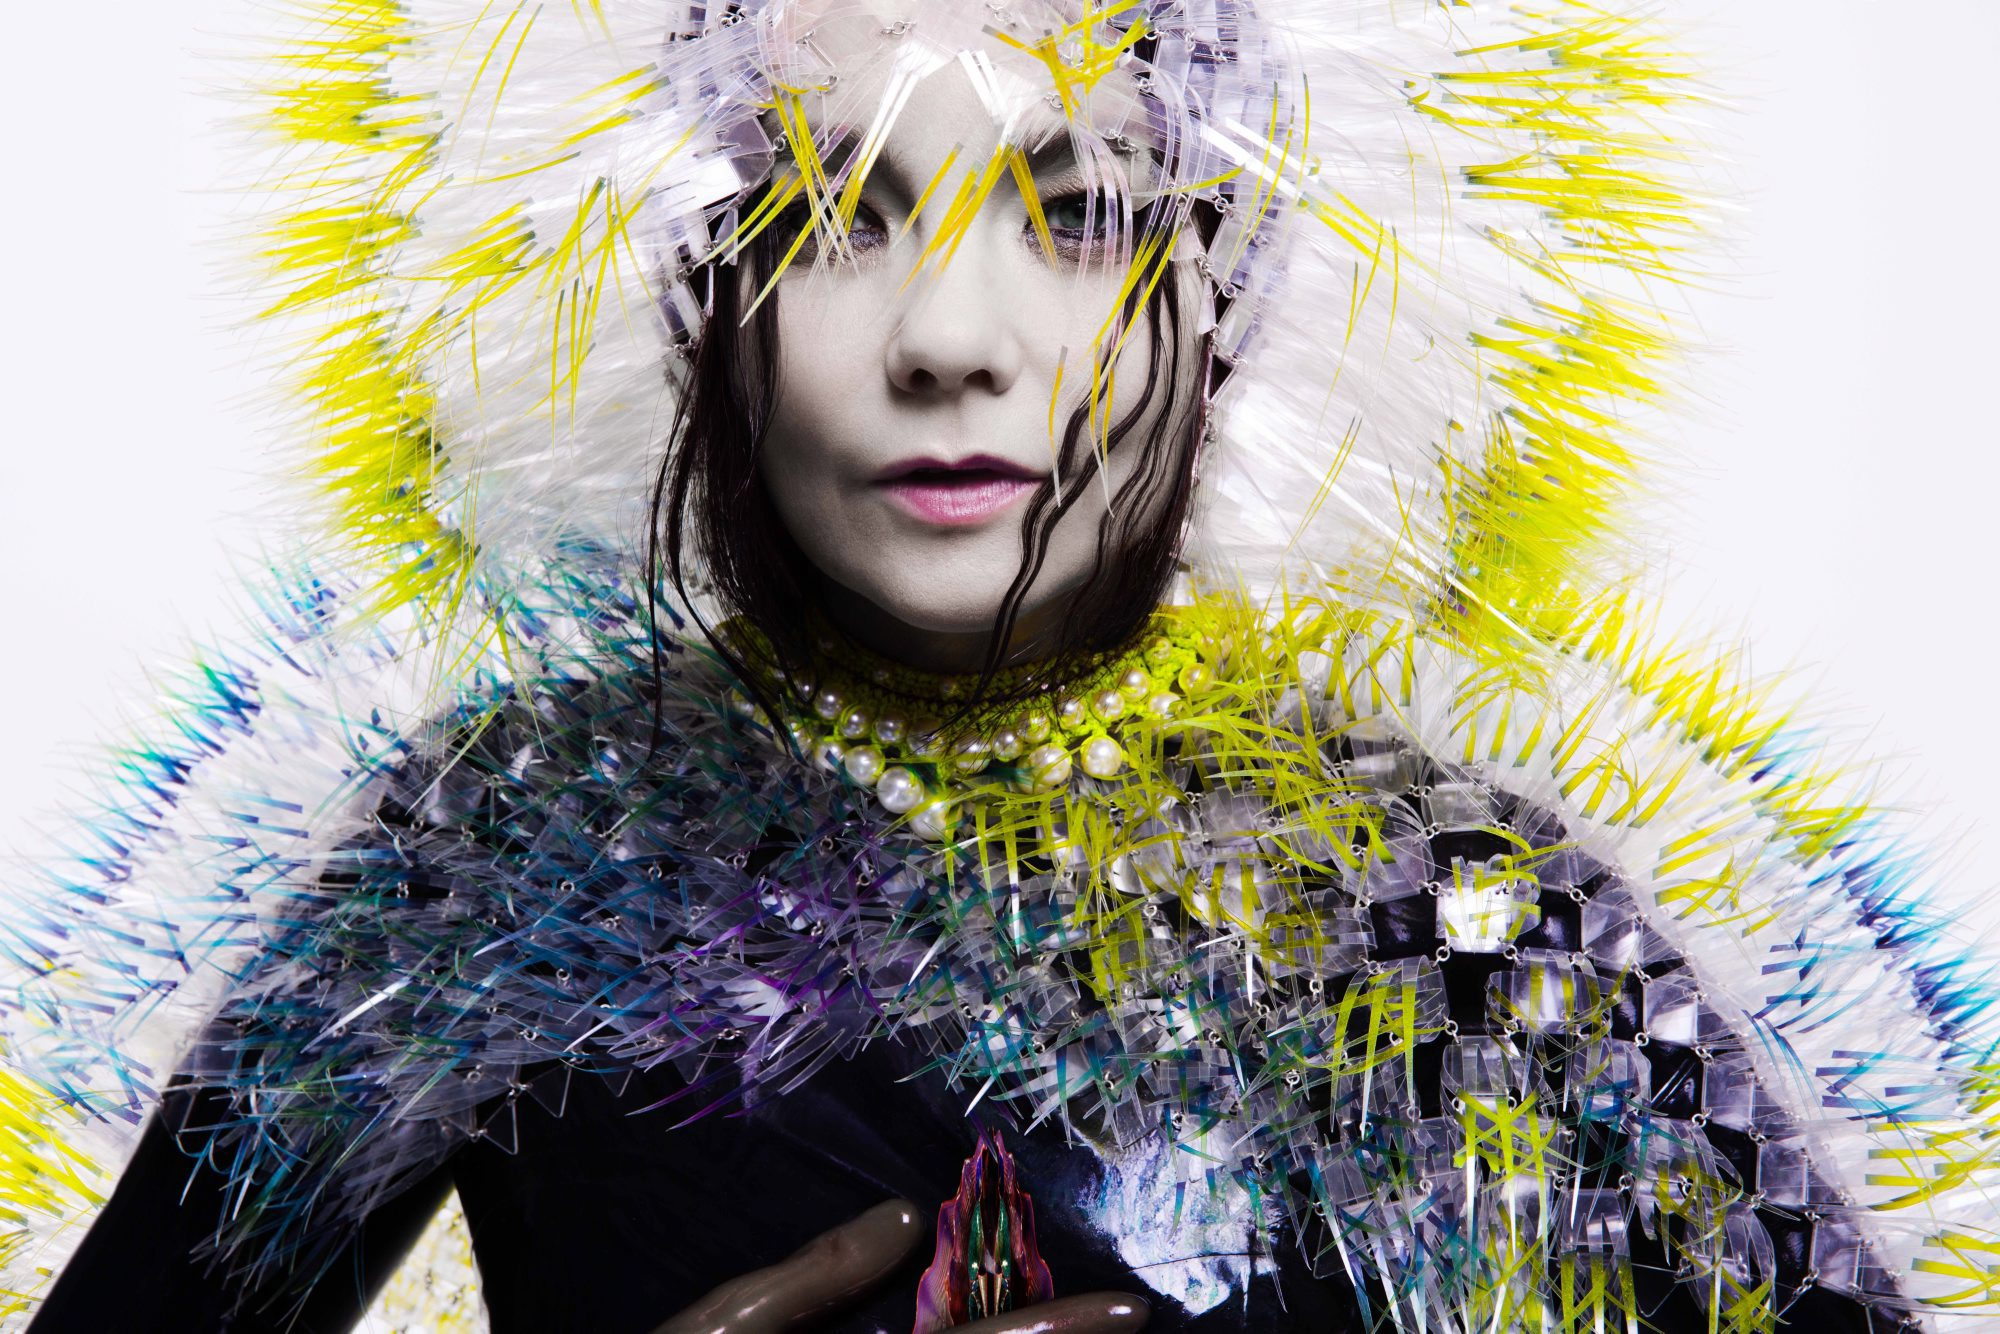 Björk and Missy Elliott Set the Bar High for the First Day of FYF Fest 2017